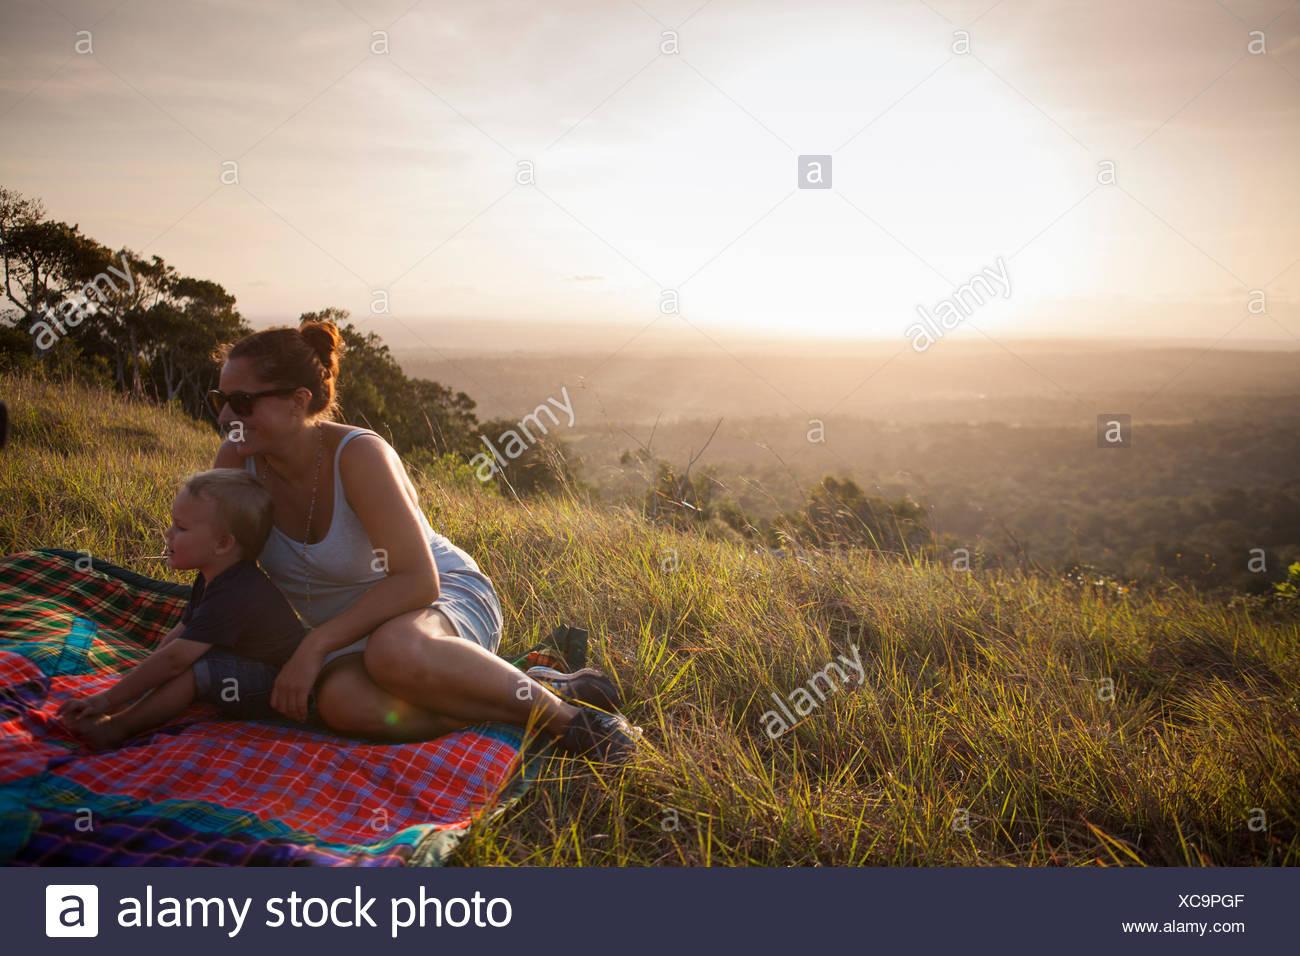 Mutter und Sohn in einem Feld in Kenia sitzen Stockbild